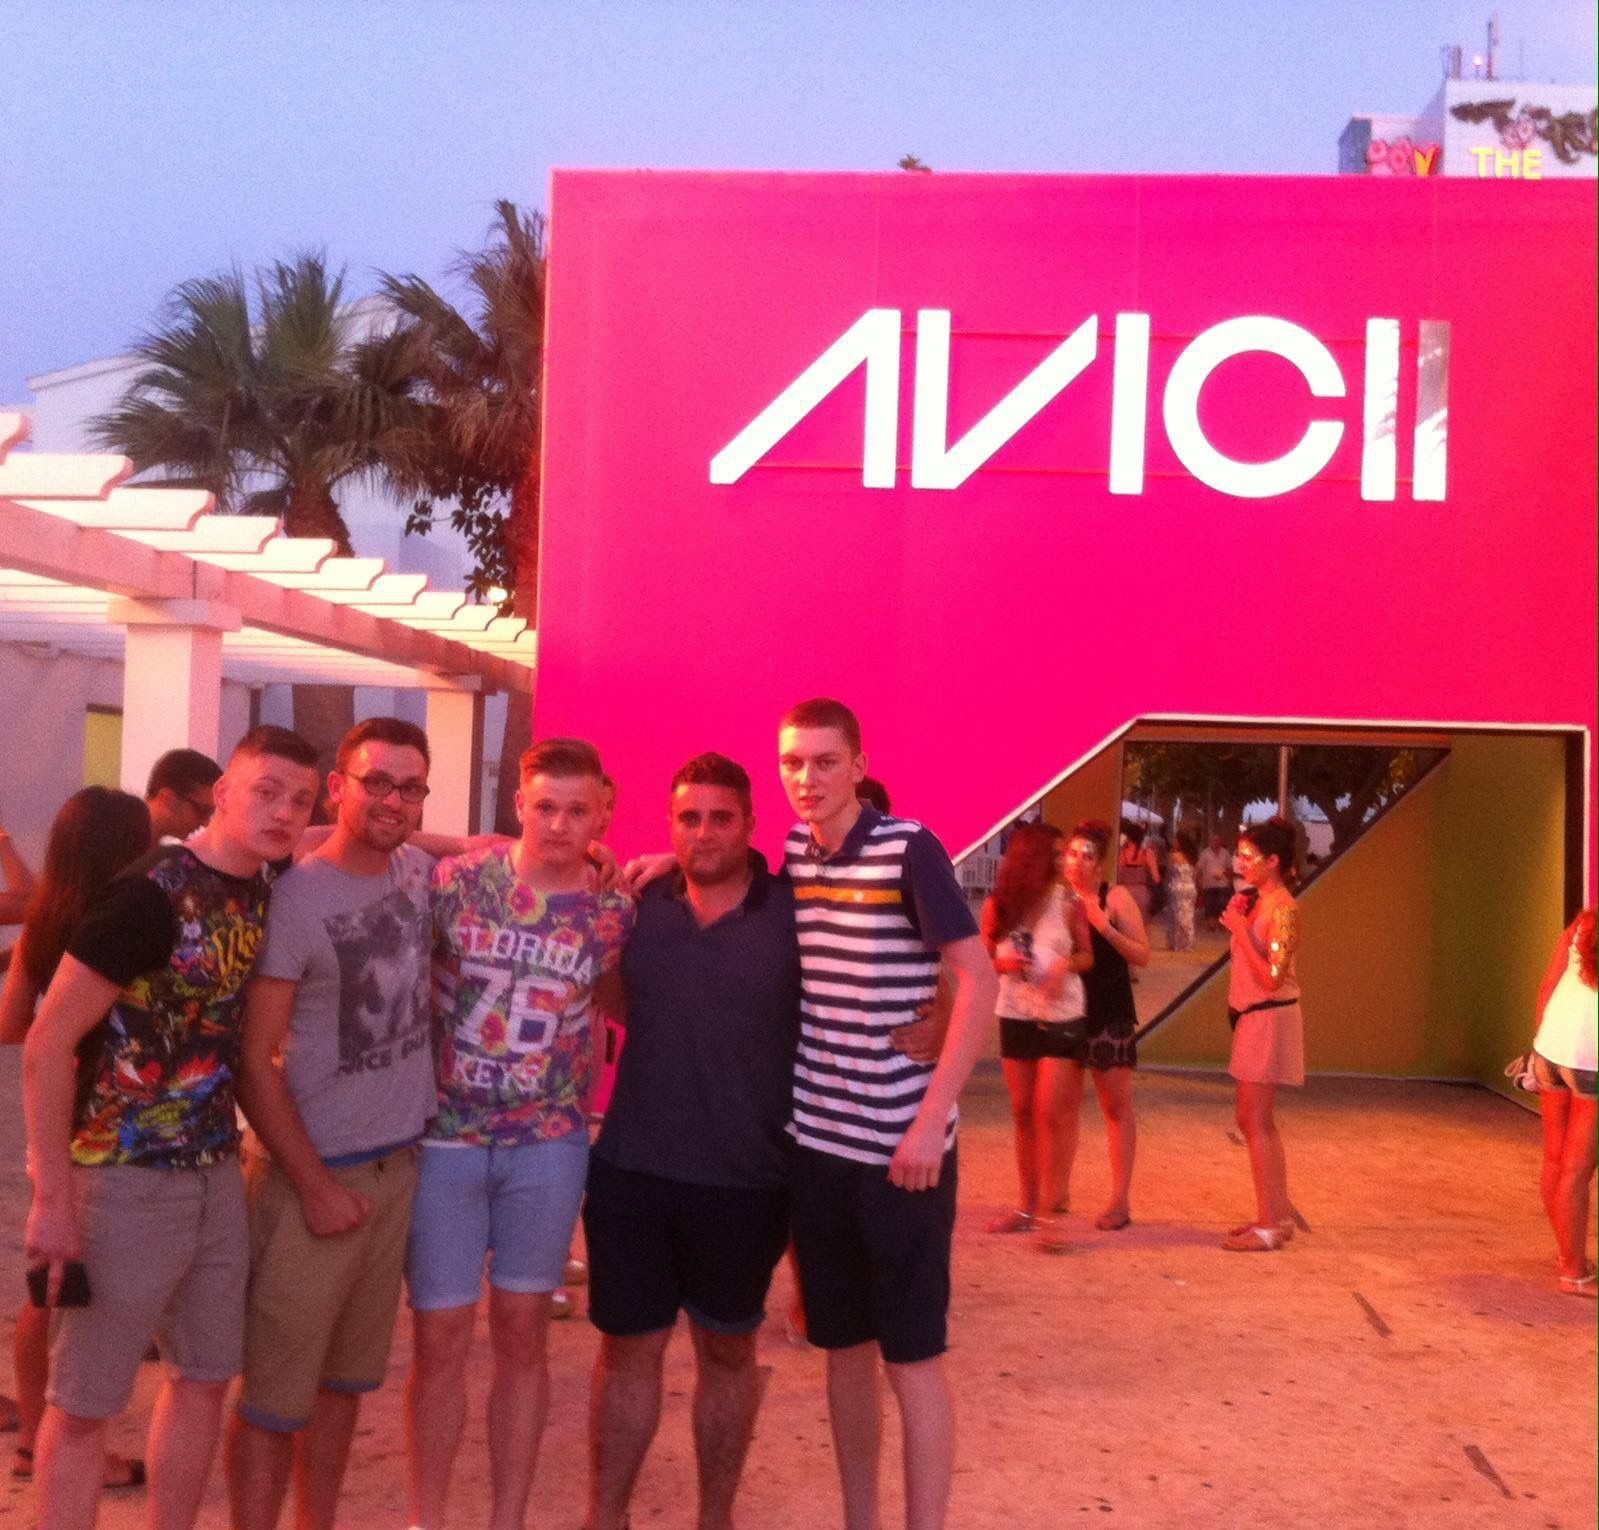 The night we saw Avicii at Ushuaia in Ibiza.